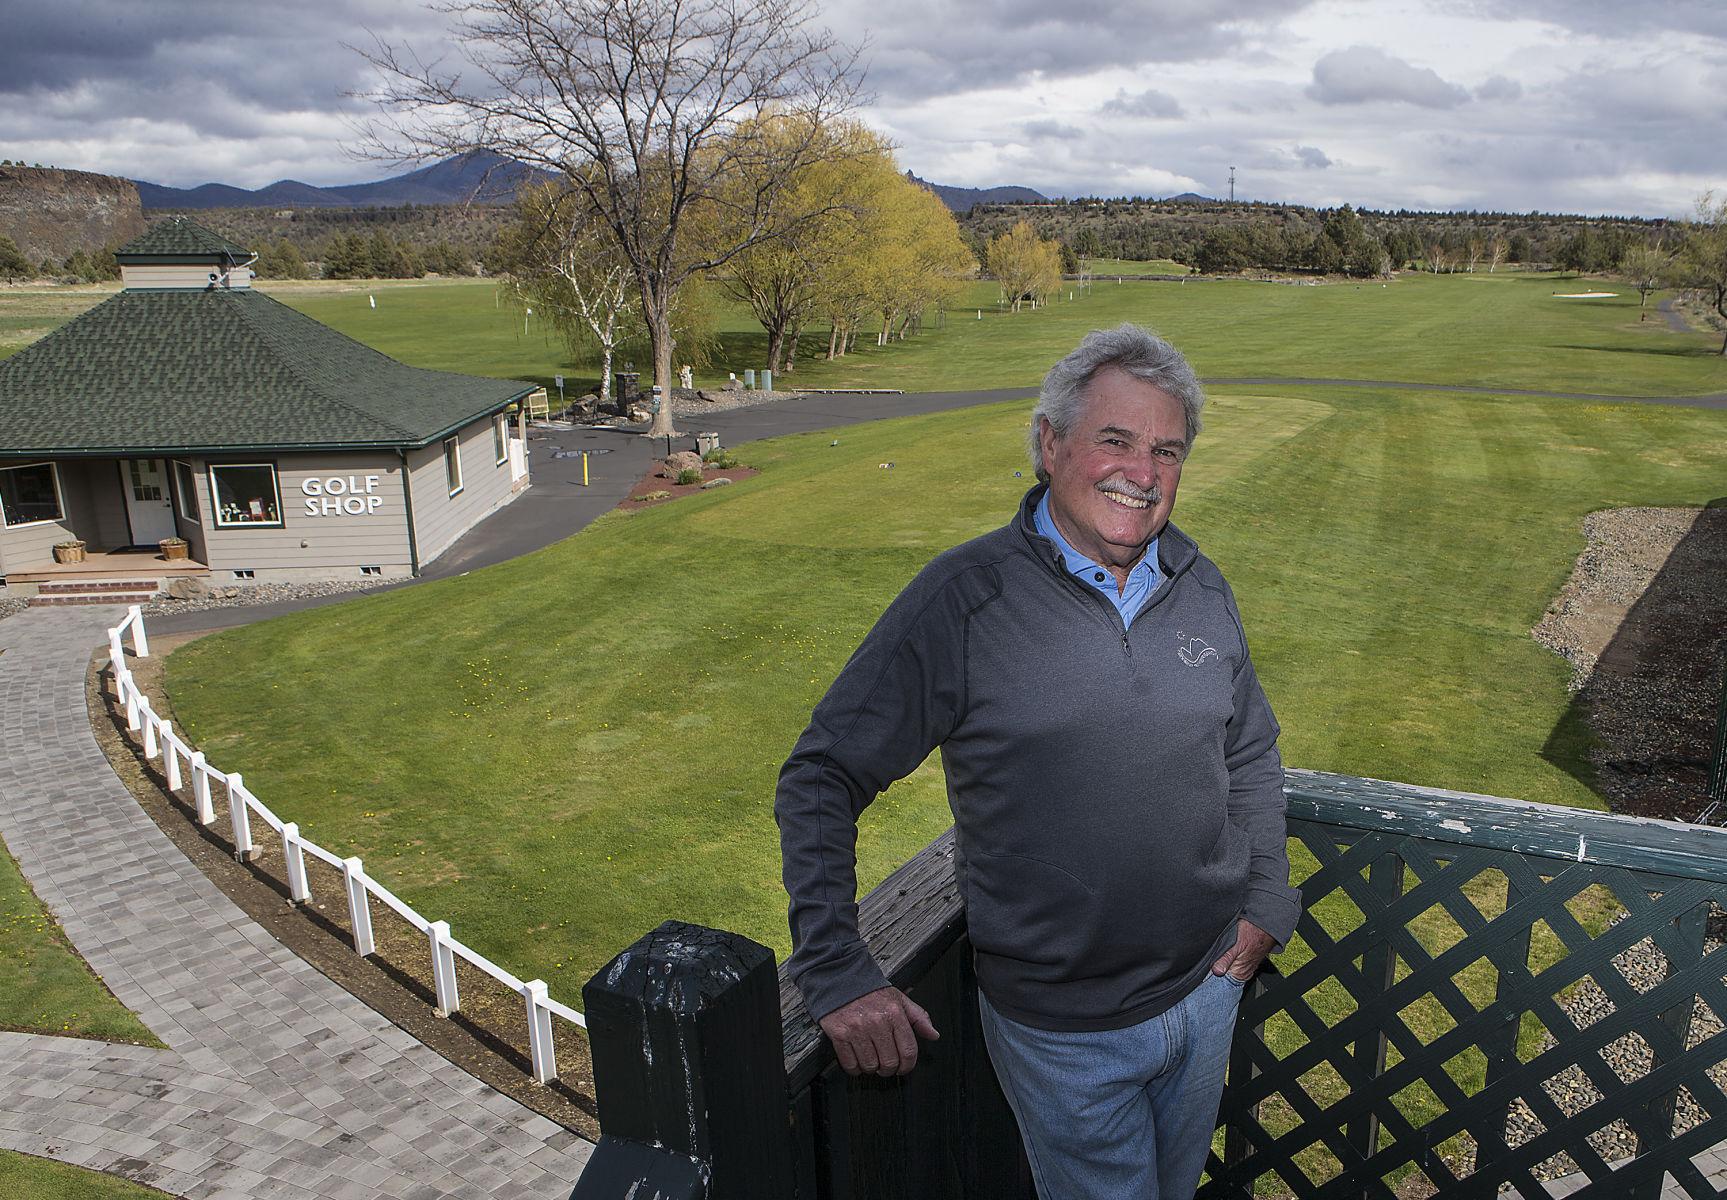 bendbulletin.com - BRIAN RATHBONE The Bulletin - Pat Huffer's golf life comes full circle